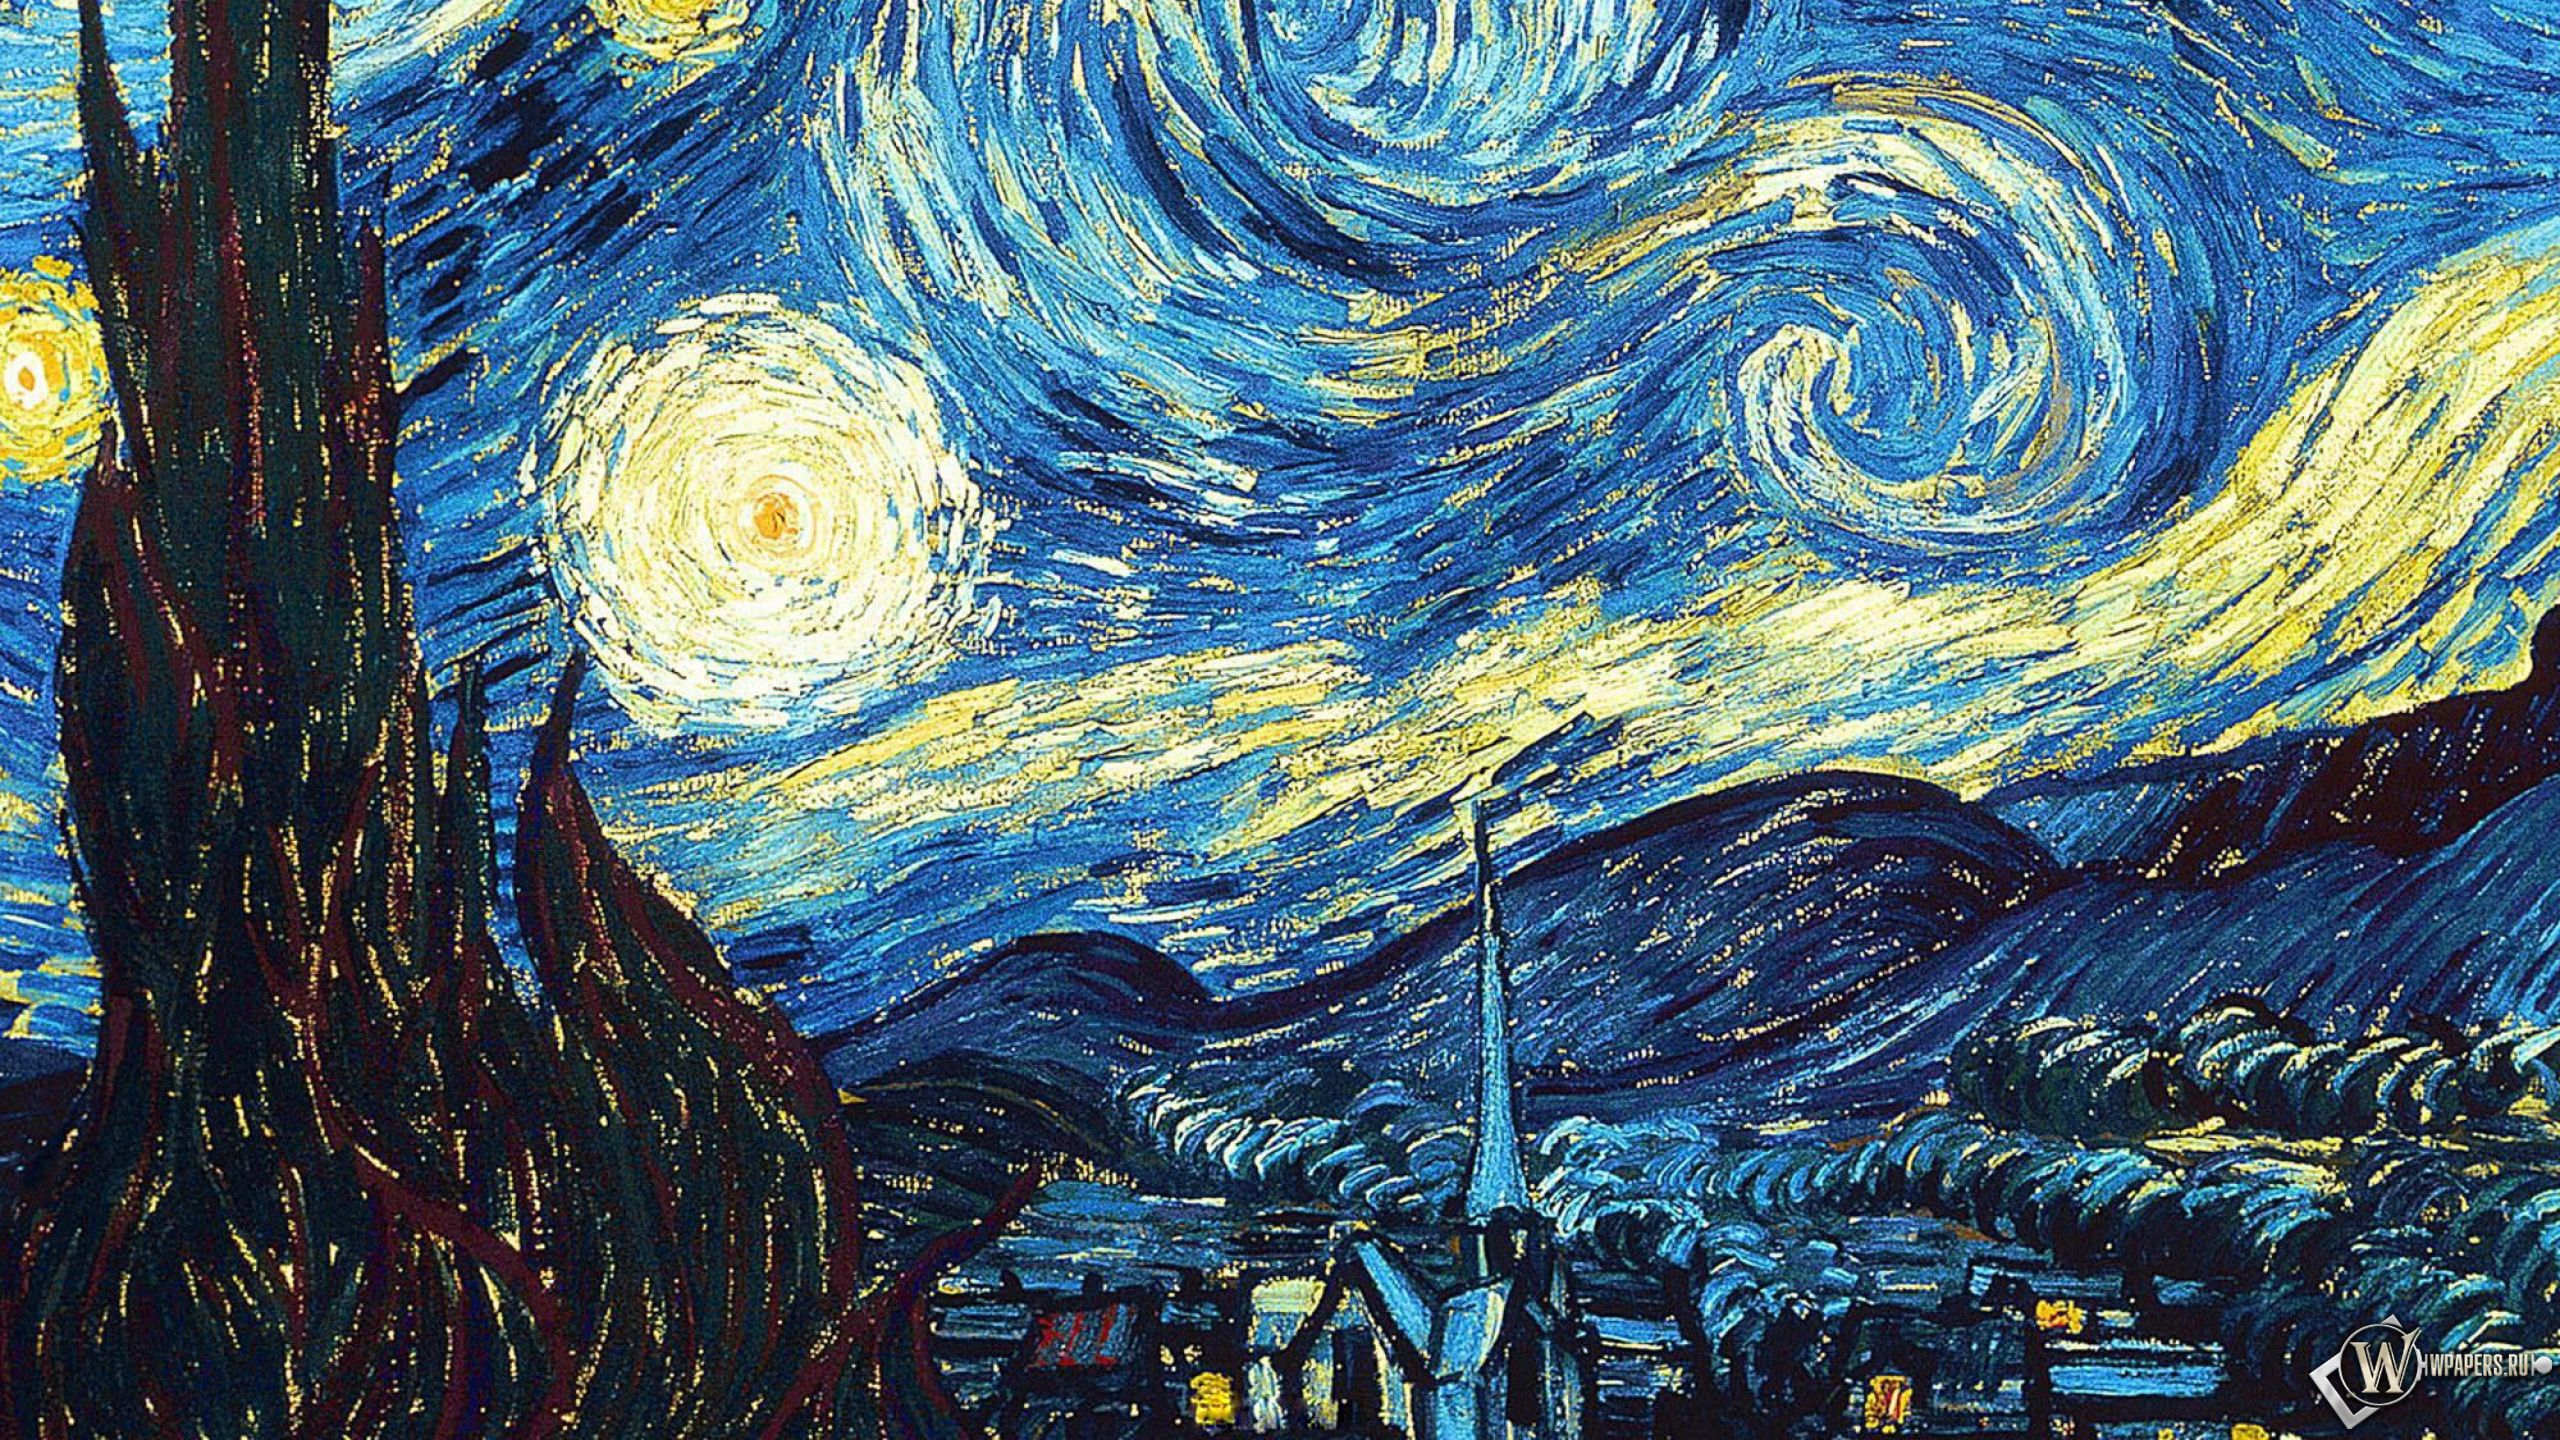 2560x1440 Wallpaper vincent van gogh, the starry night, oil, canvas